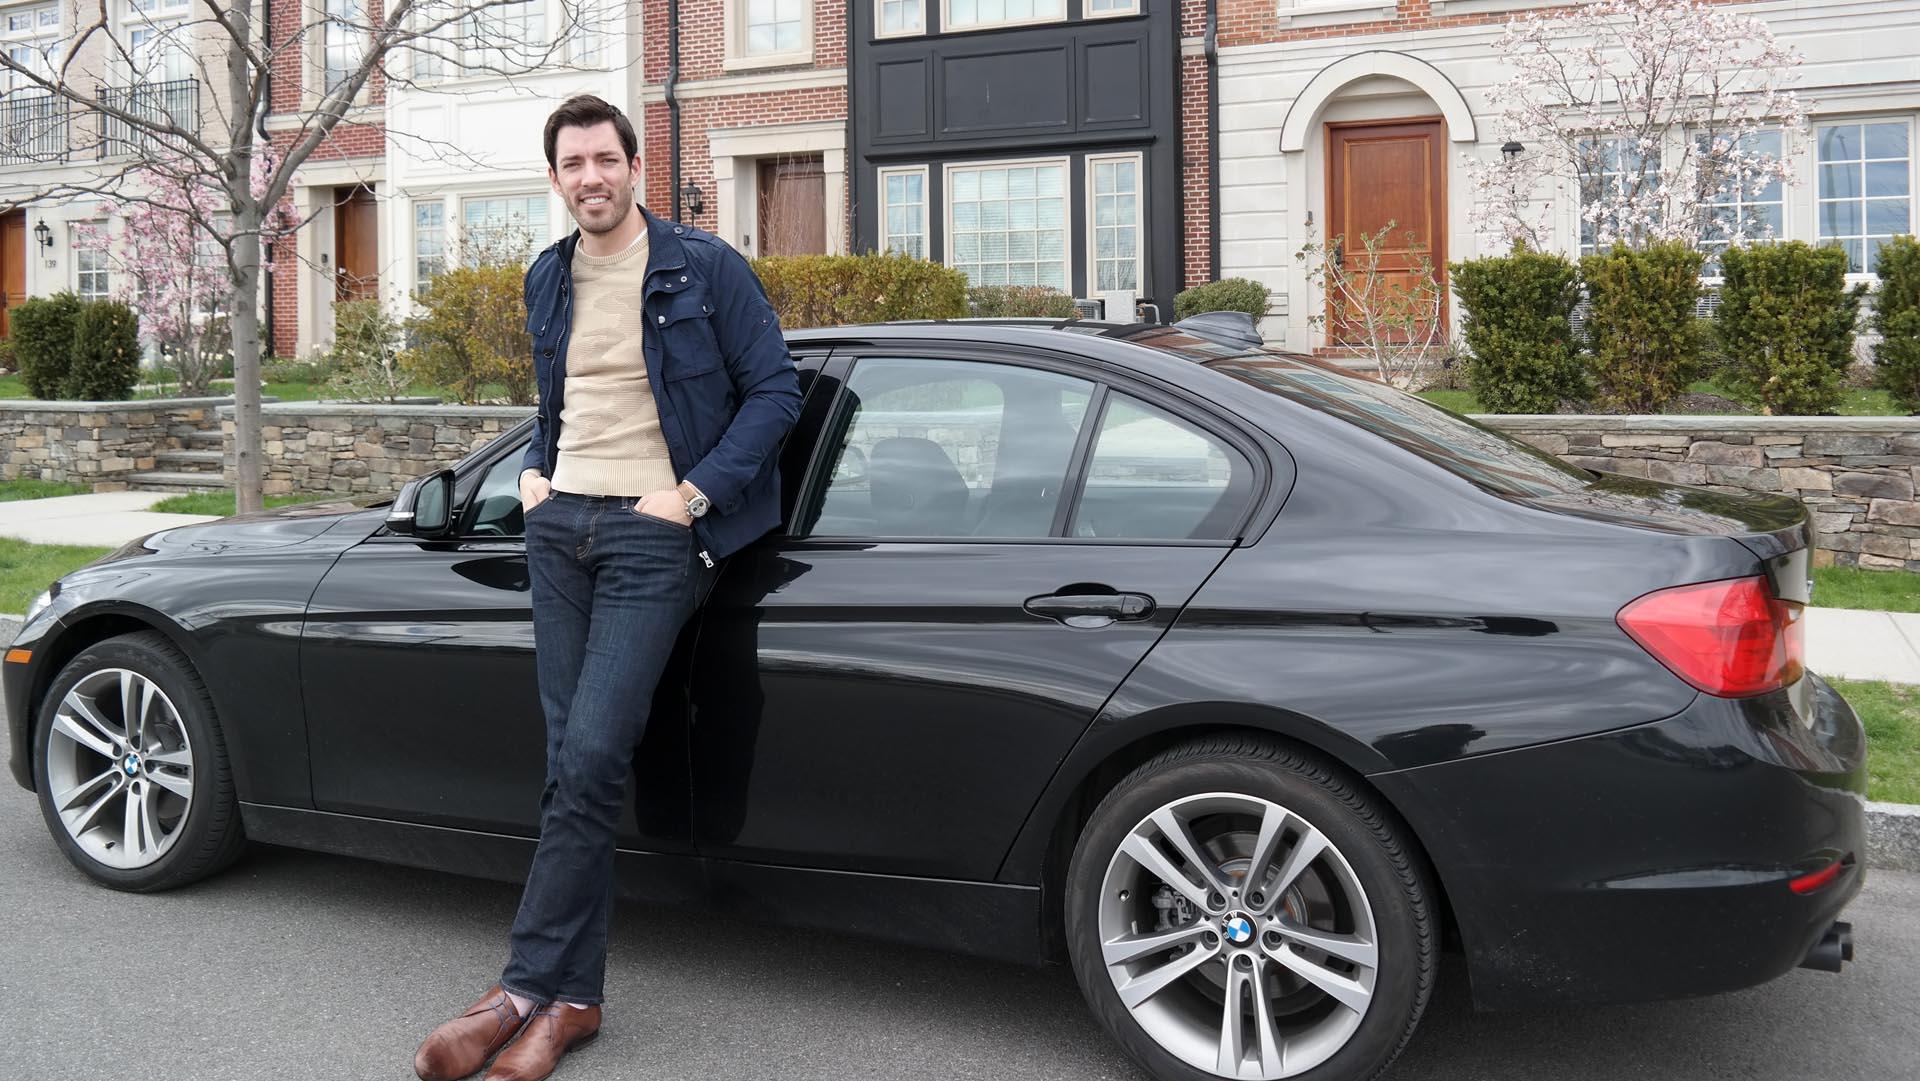 Drew with his 2013 BMW 328xi